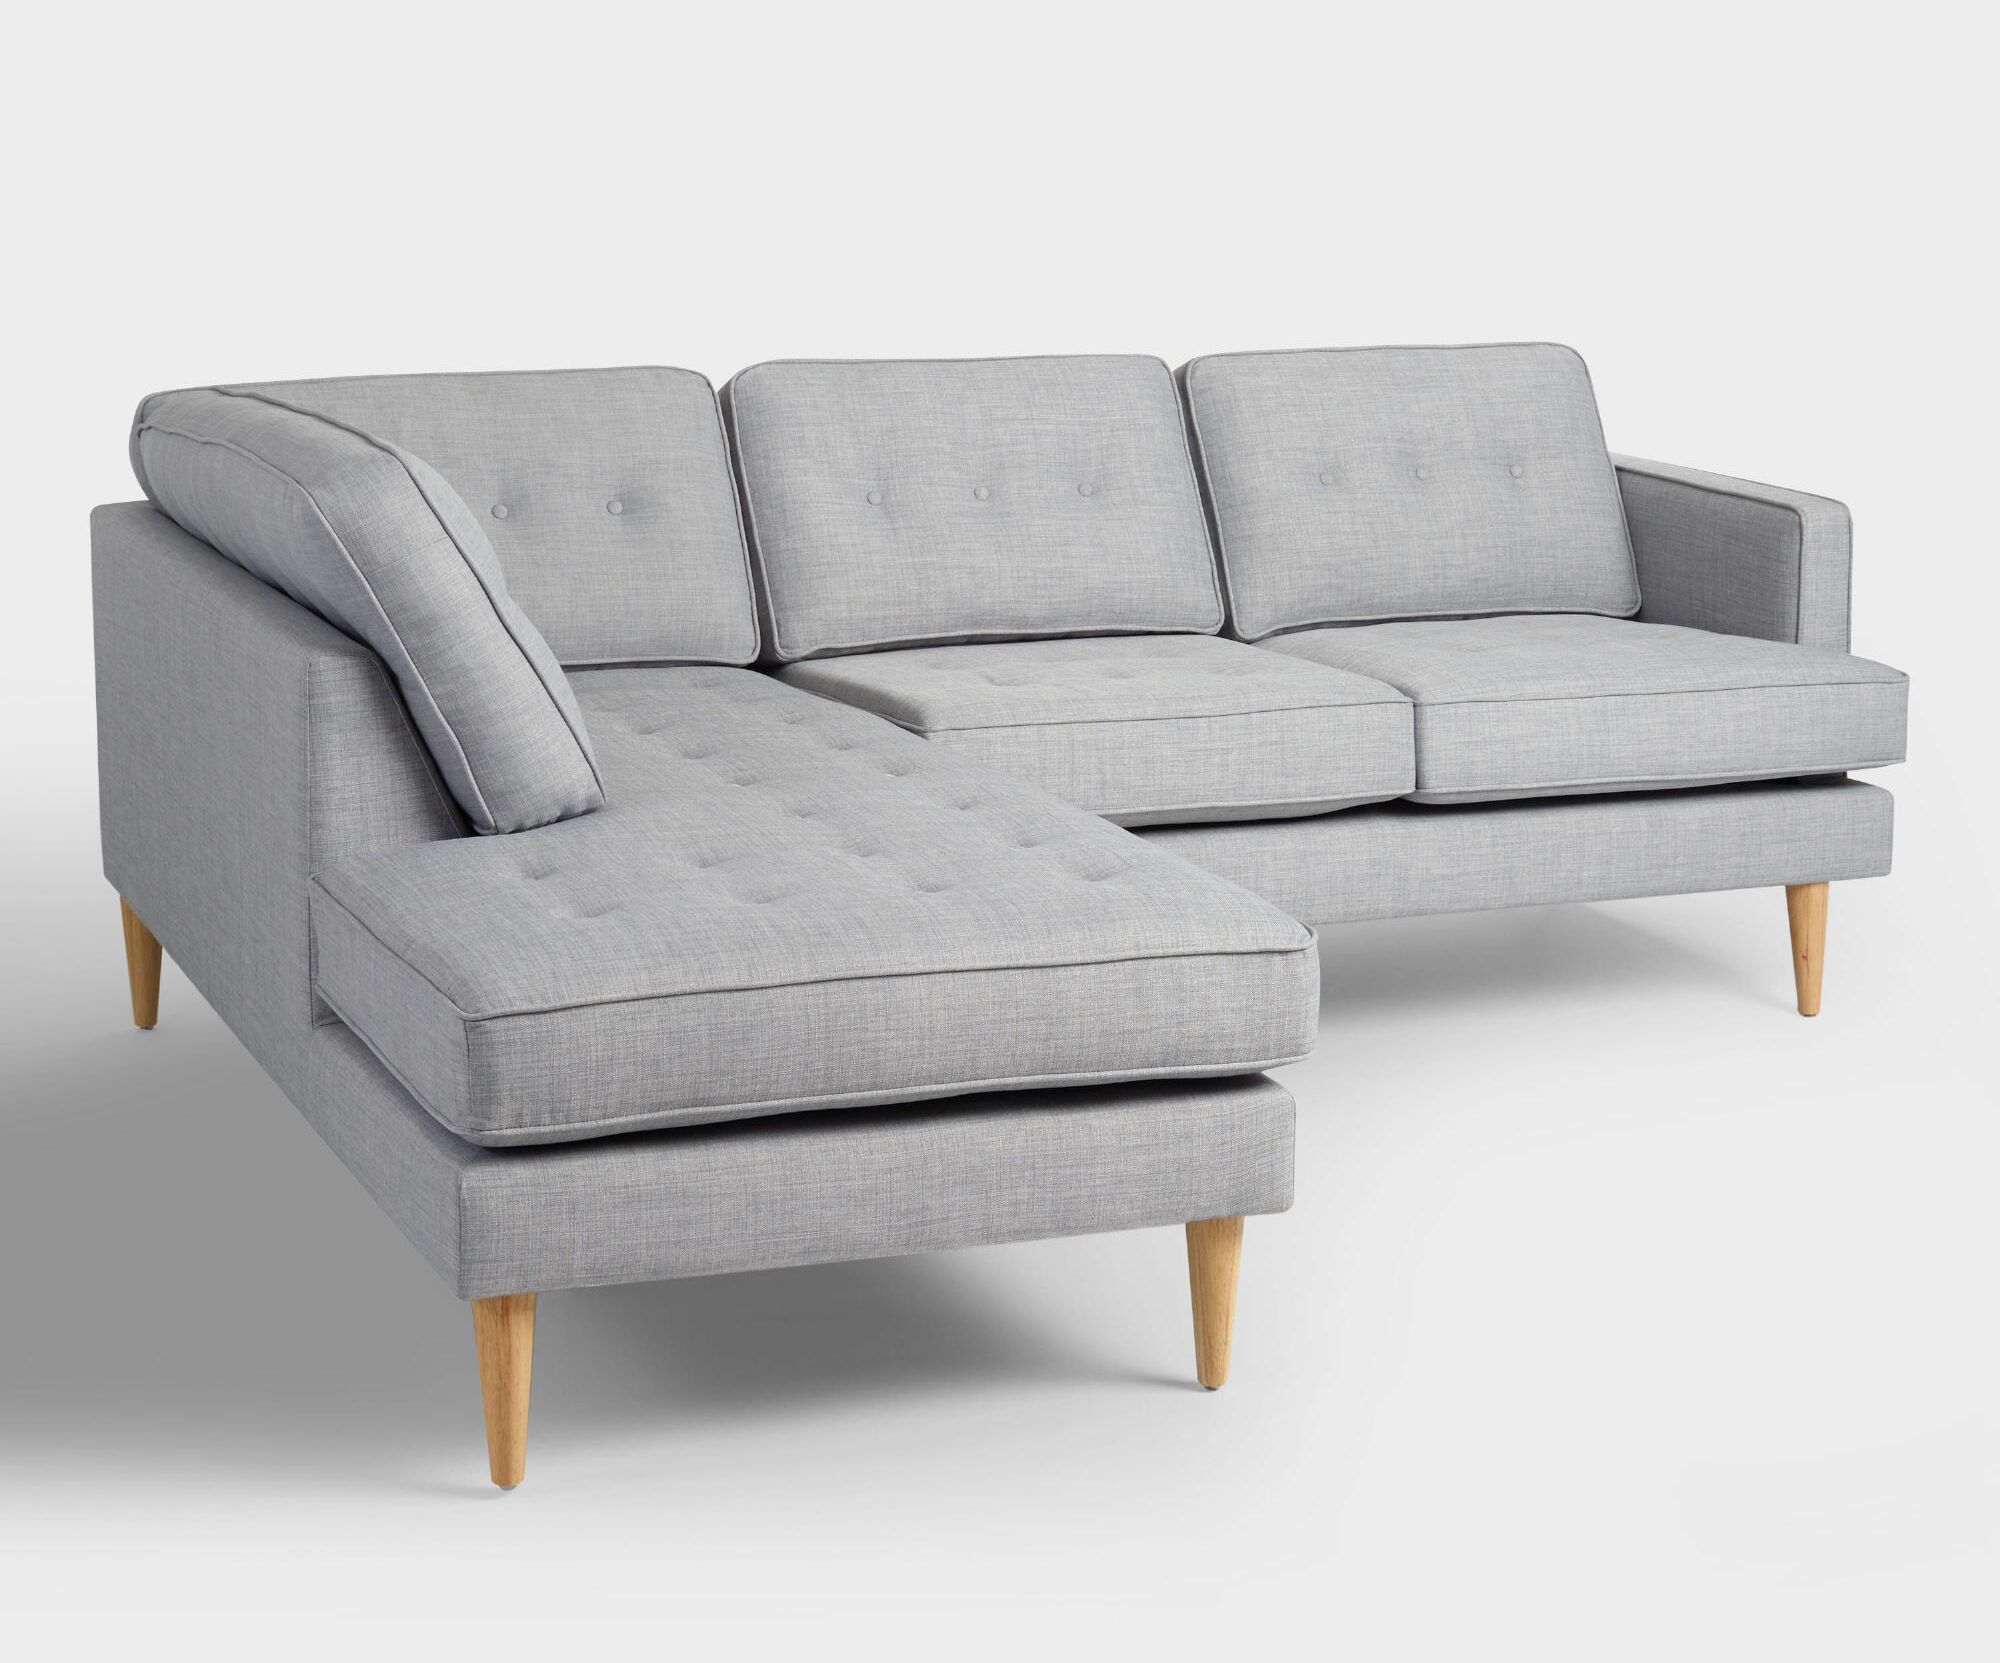 13 Affordable & Stylish Sofas Under 1,000 Apartment